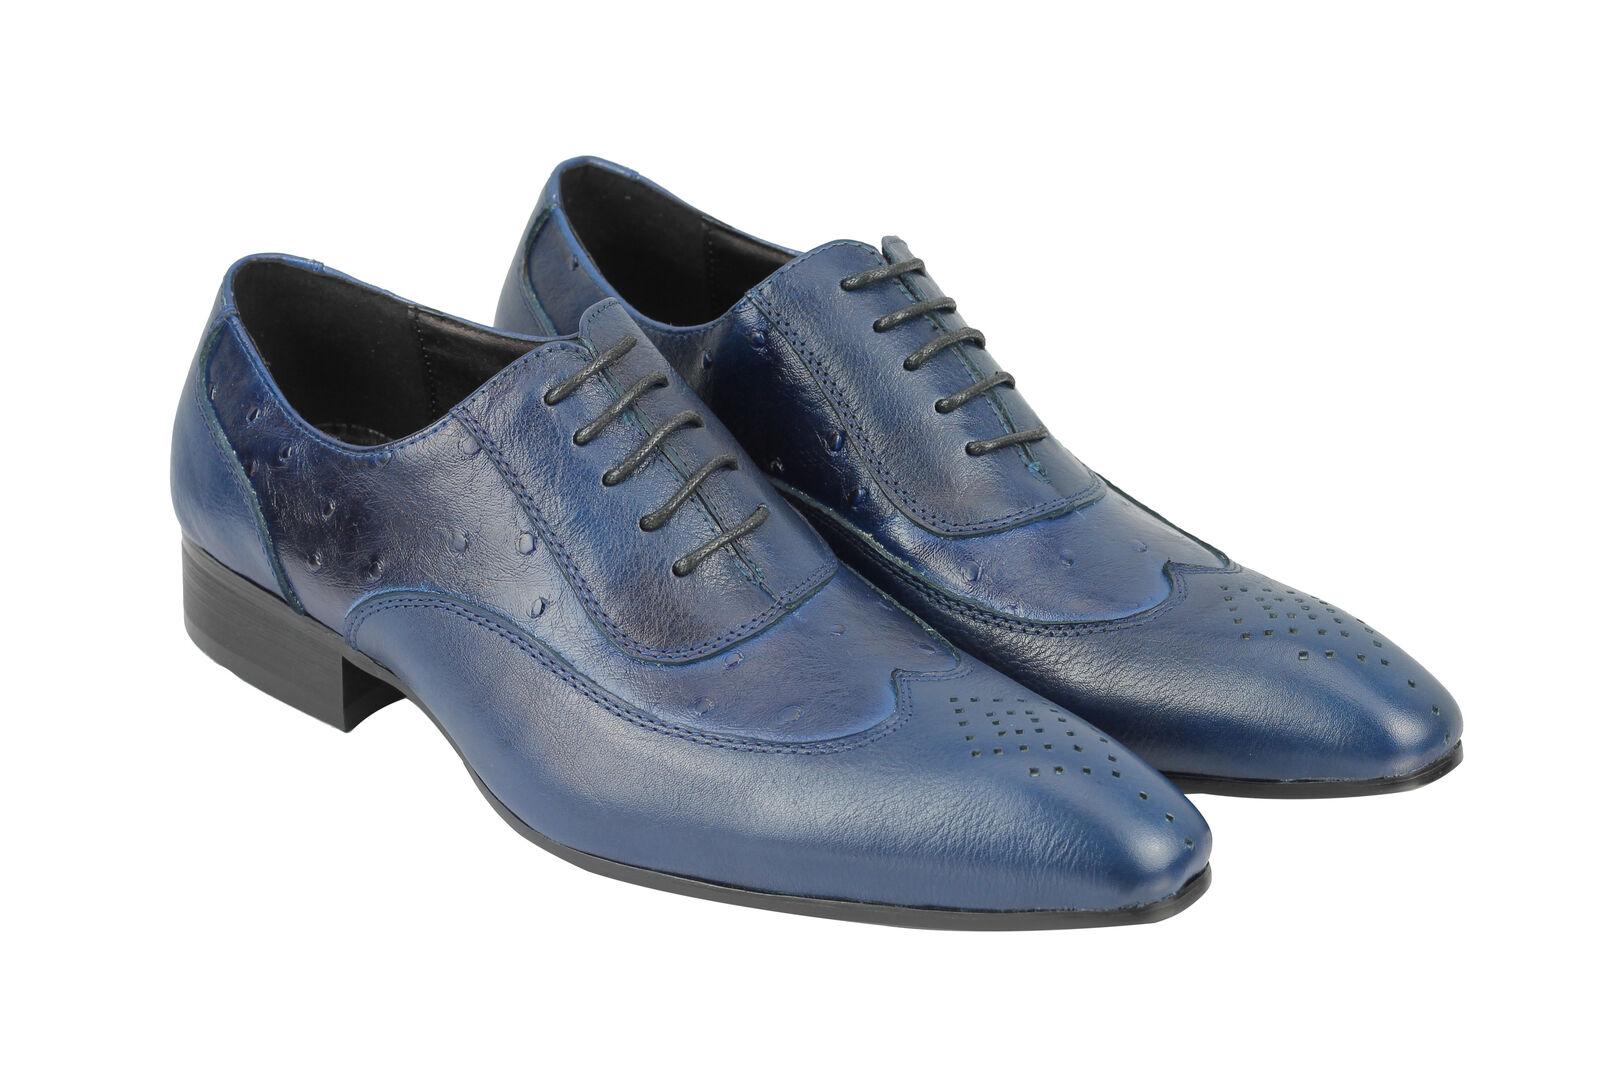 Mens All Blau Real Leder 2 Tone Blau All Italian Style Dress Schuhes 6.5 7 8 9 10 11 11.5 72c4d4